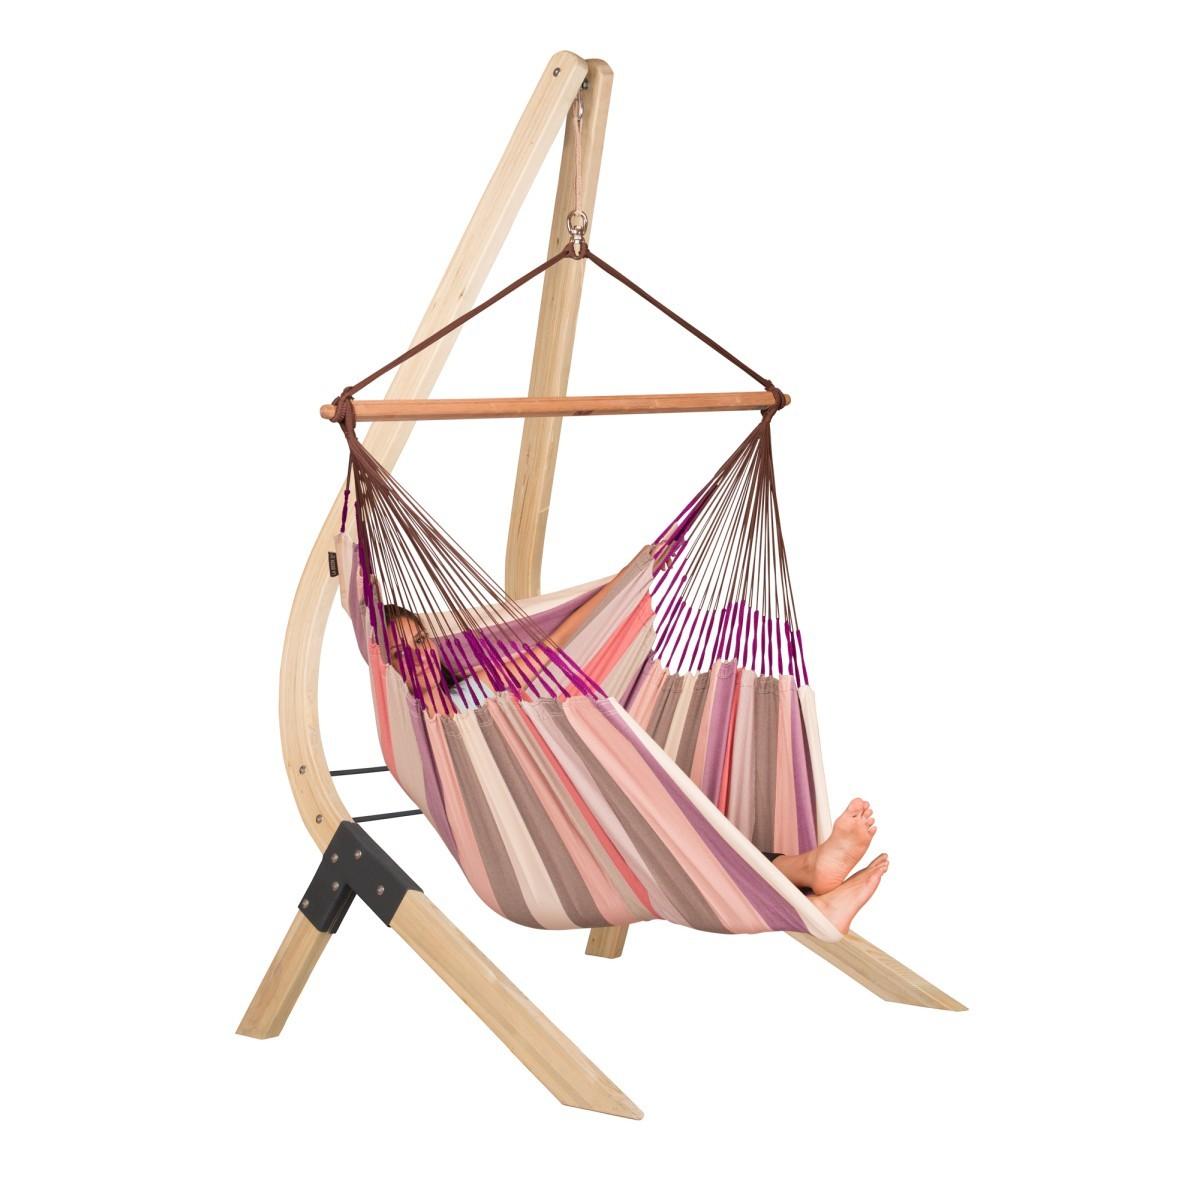 la siesta chaise hamac lounger domingo plum support en bois vela. Black Bedroom Furniture Sets. Home Design Ideas